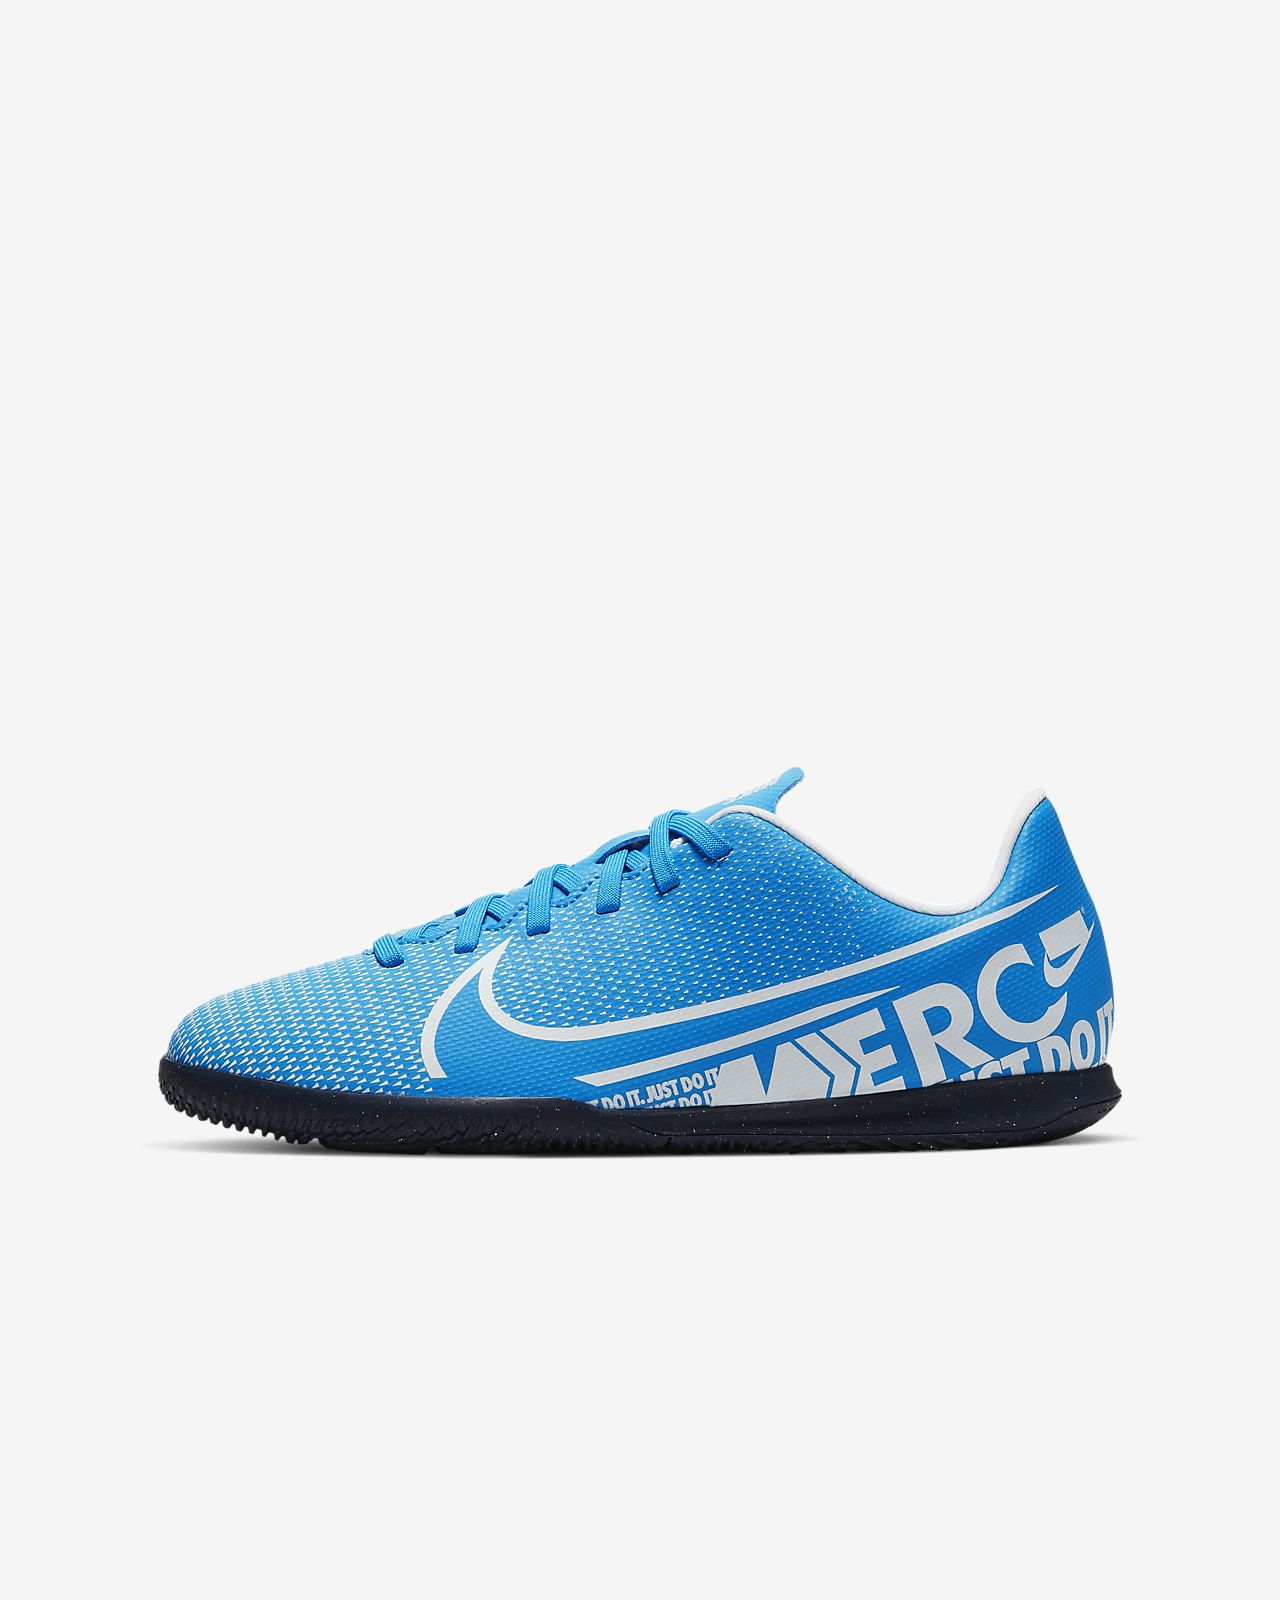 Nike Jr Mercurial Vapor 13 Club Ic Fussballschuh Fur Hallen Und Hartplatze Fur Jungere Altere Kinder